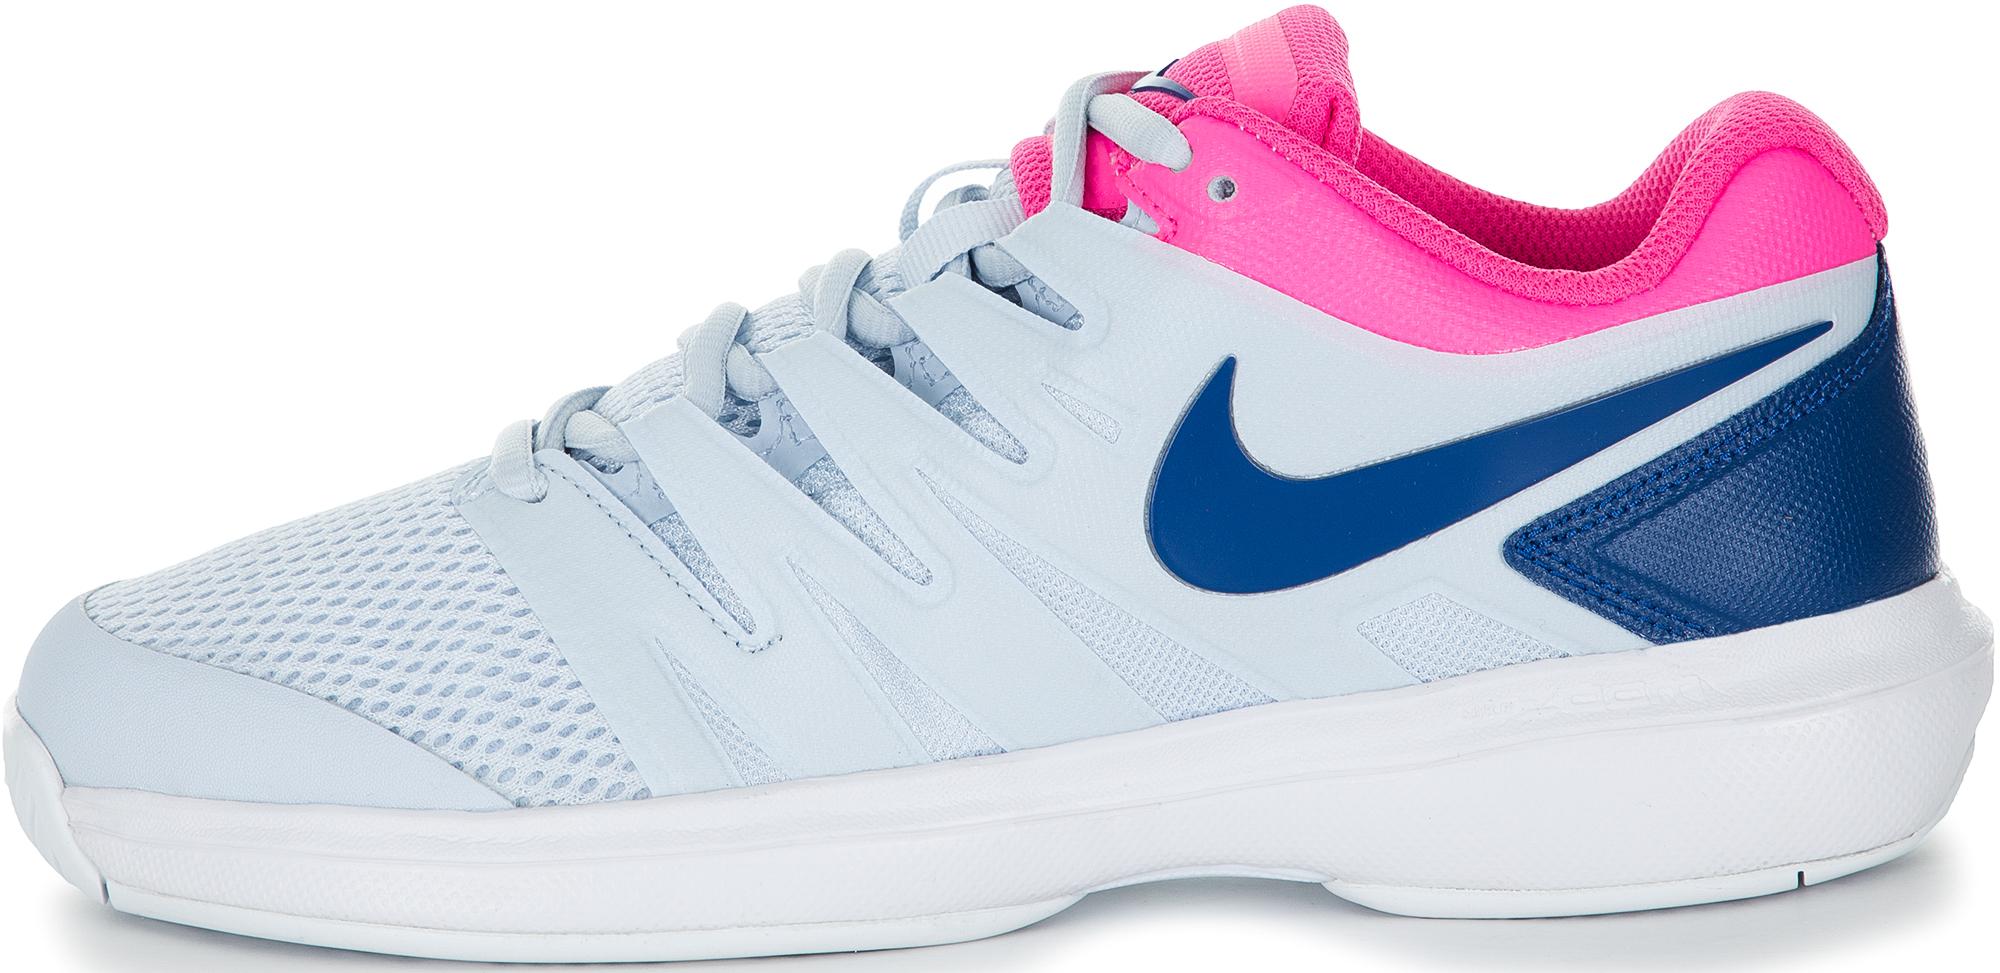 цена на Nike Кроссовки женские Nike Air Zoom Prestige Hc, размер 37,5